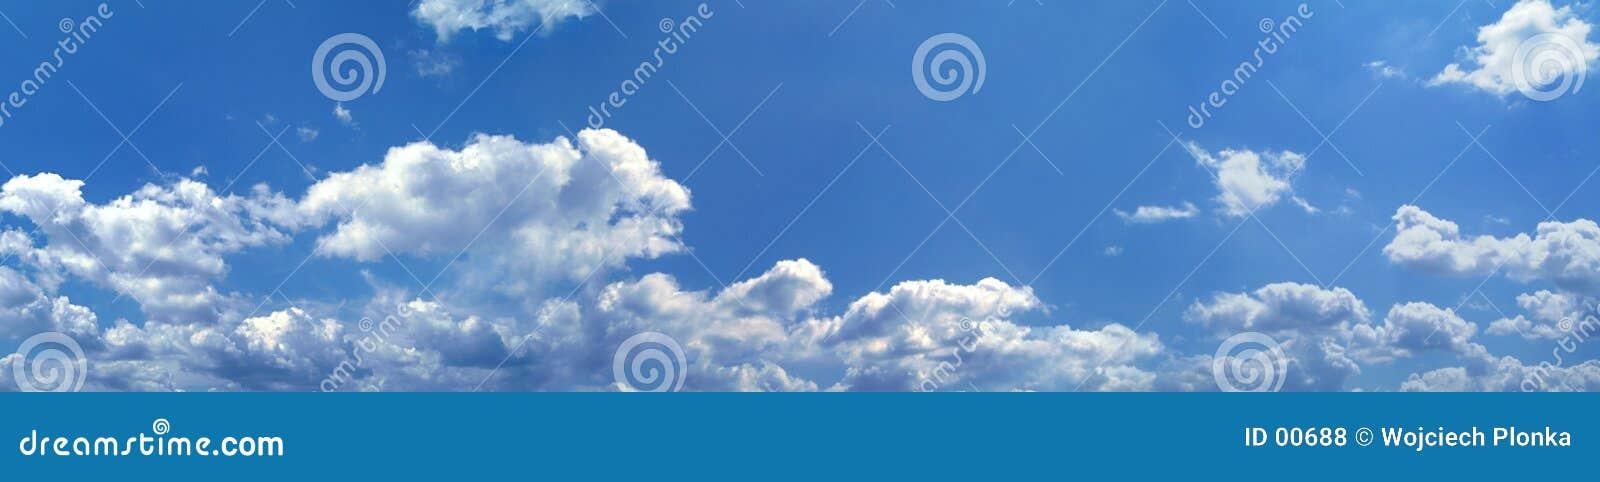 Panorama des blauen Himmels